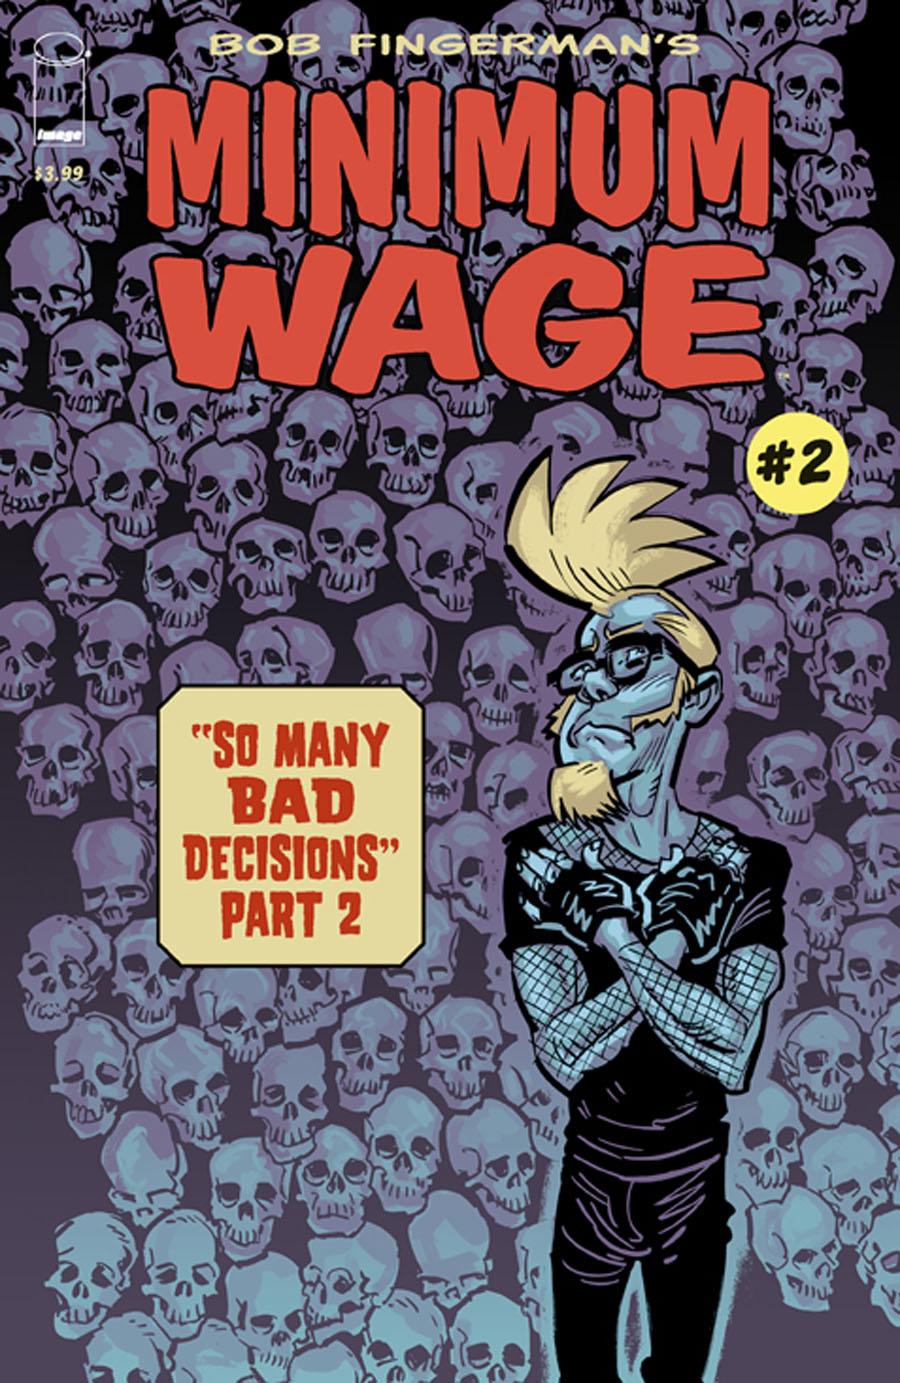 Minimum Wage So Many Bad Decisions #2